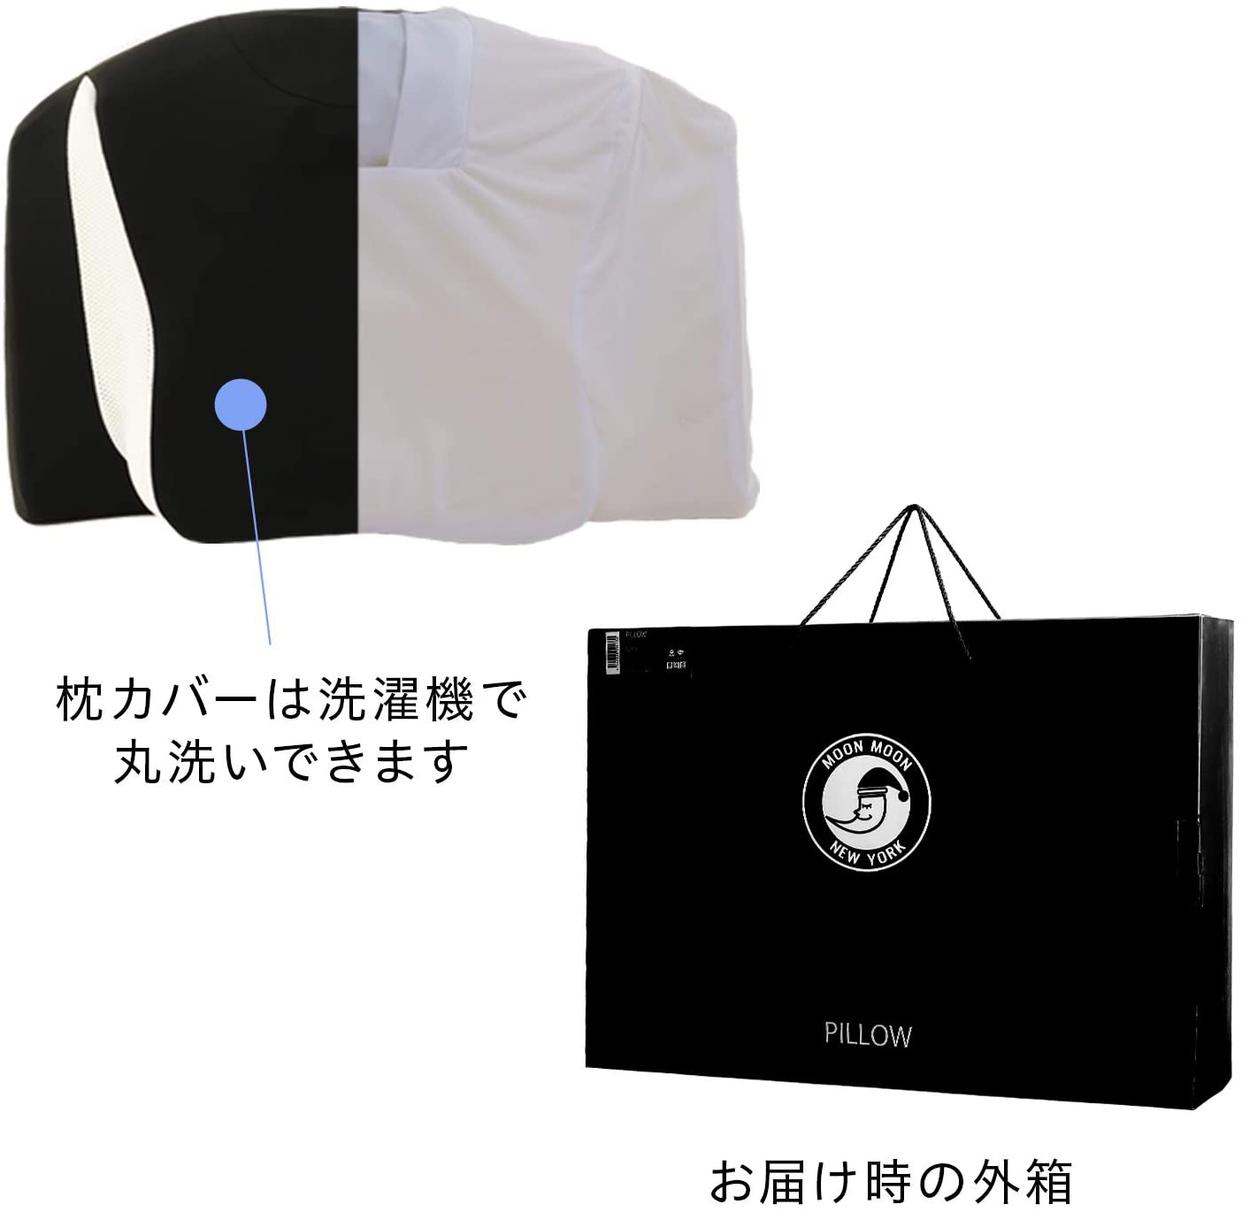 Moonmoon(ムーンムーン) YOKONE3の商品画像9